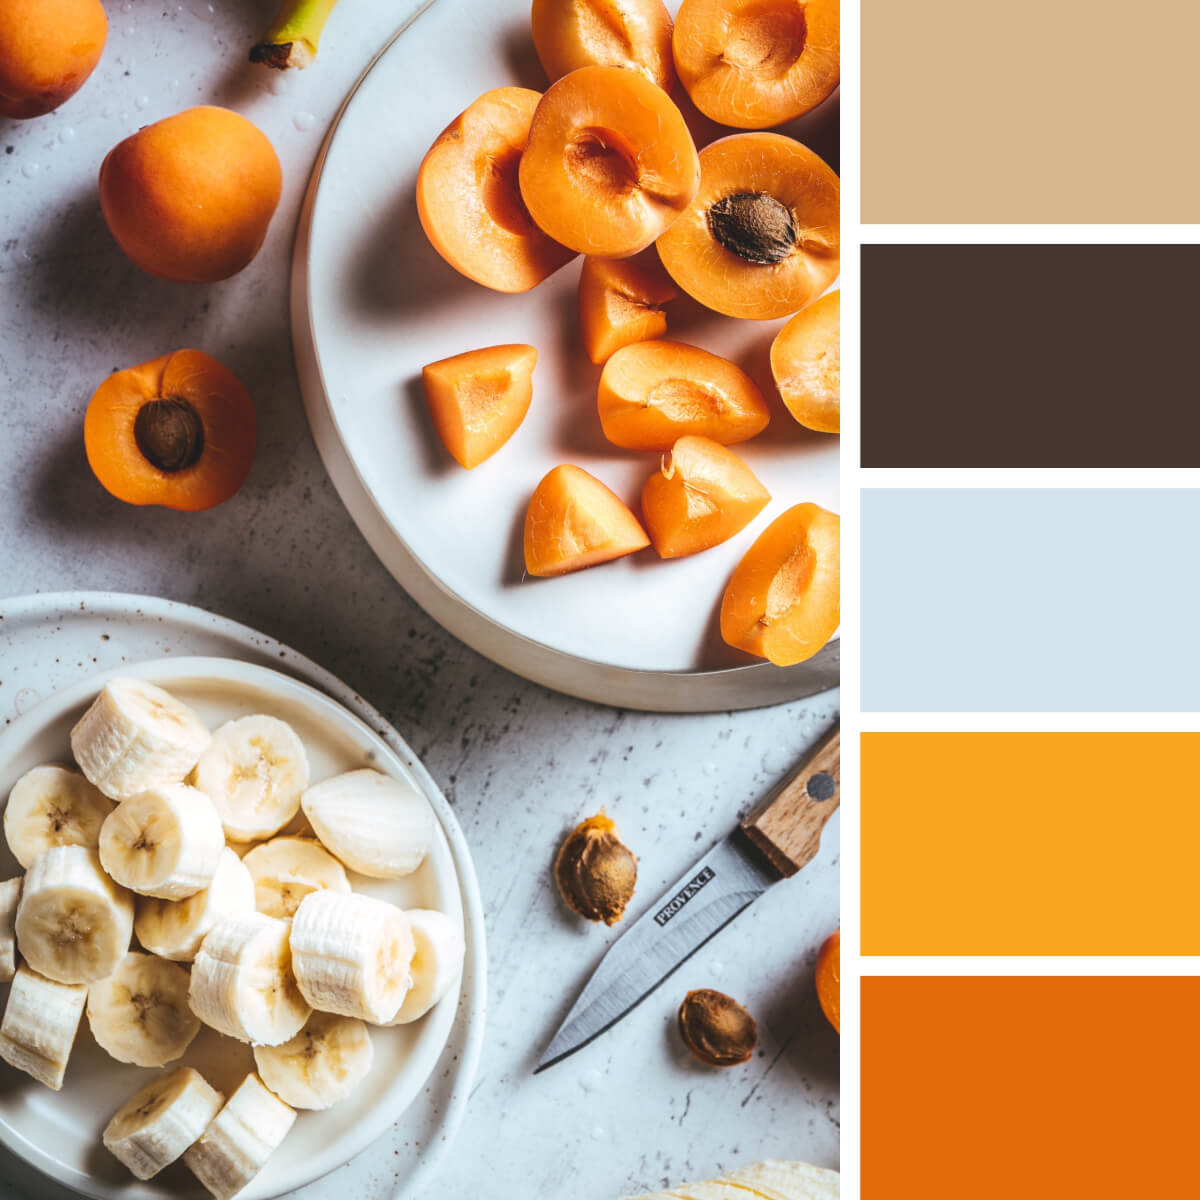 Apricot Orange & Neutral